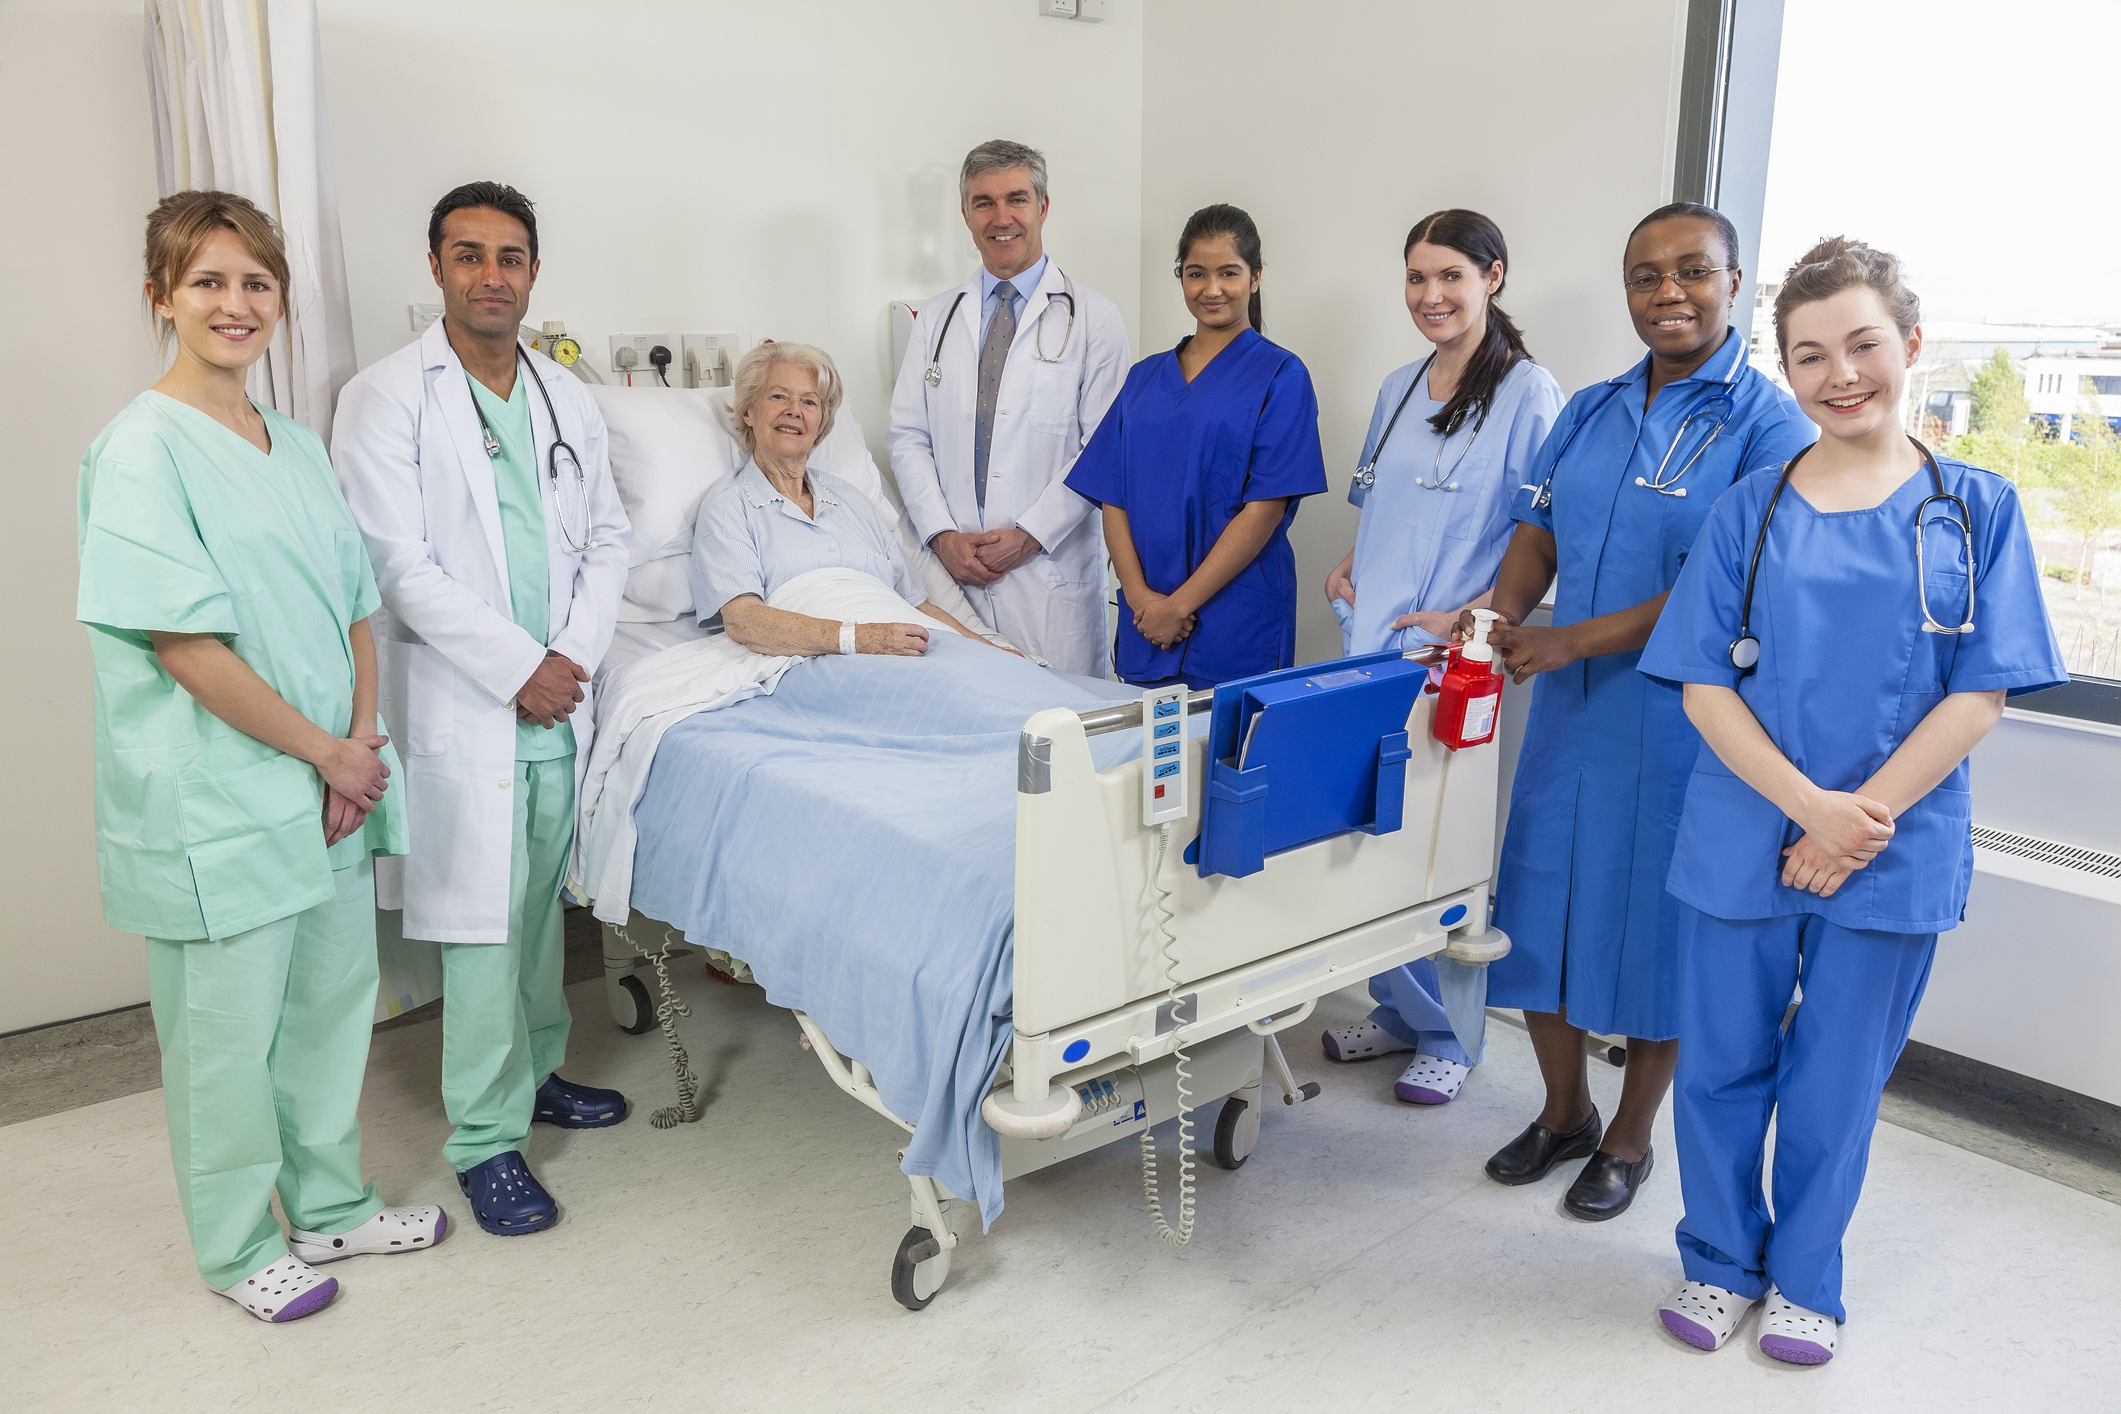 Health care professionals -